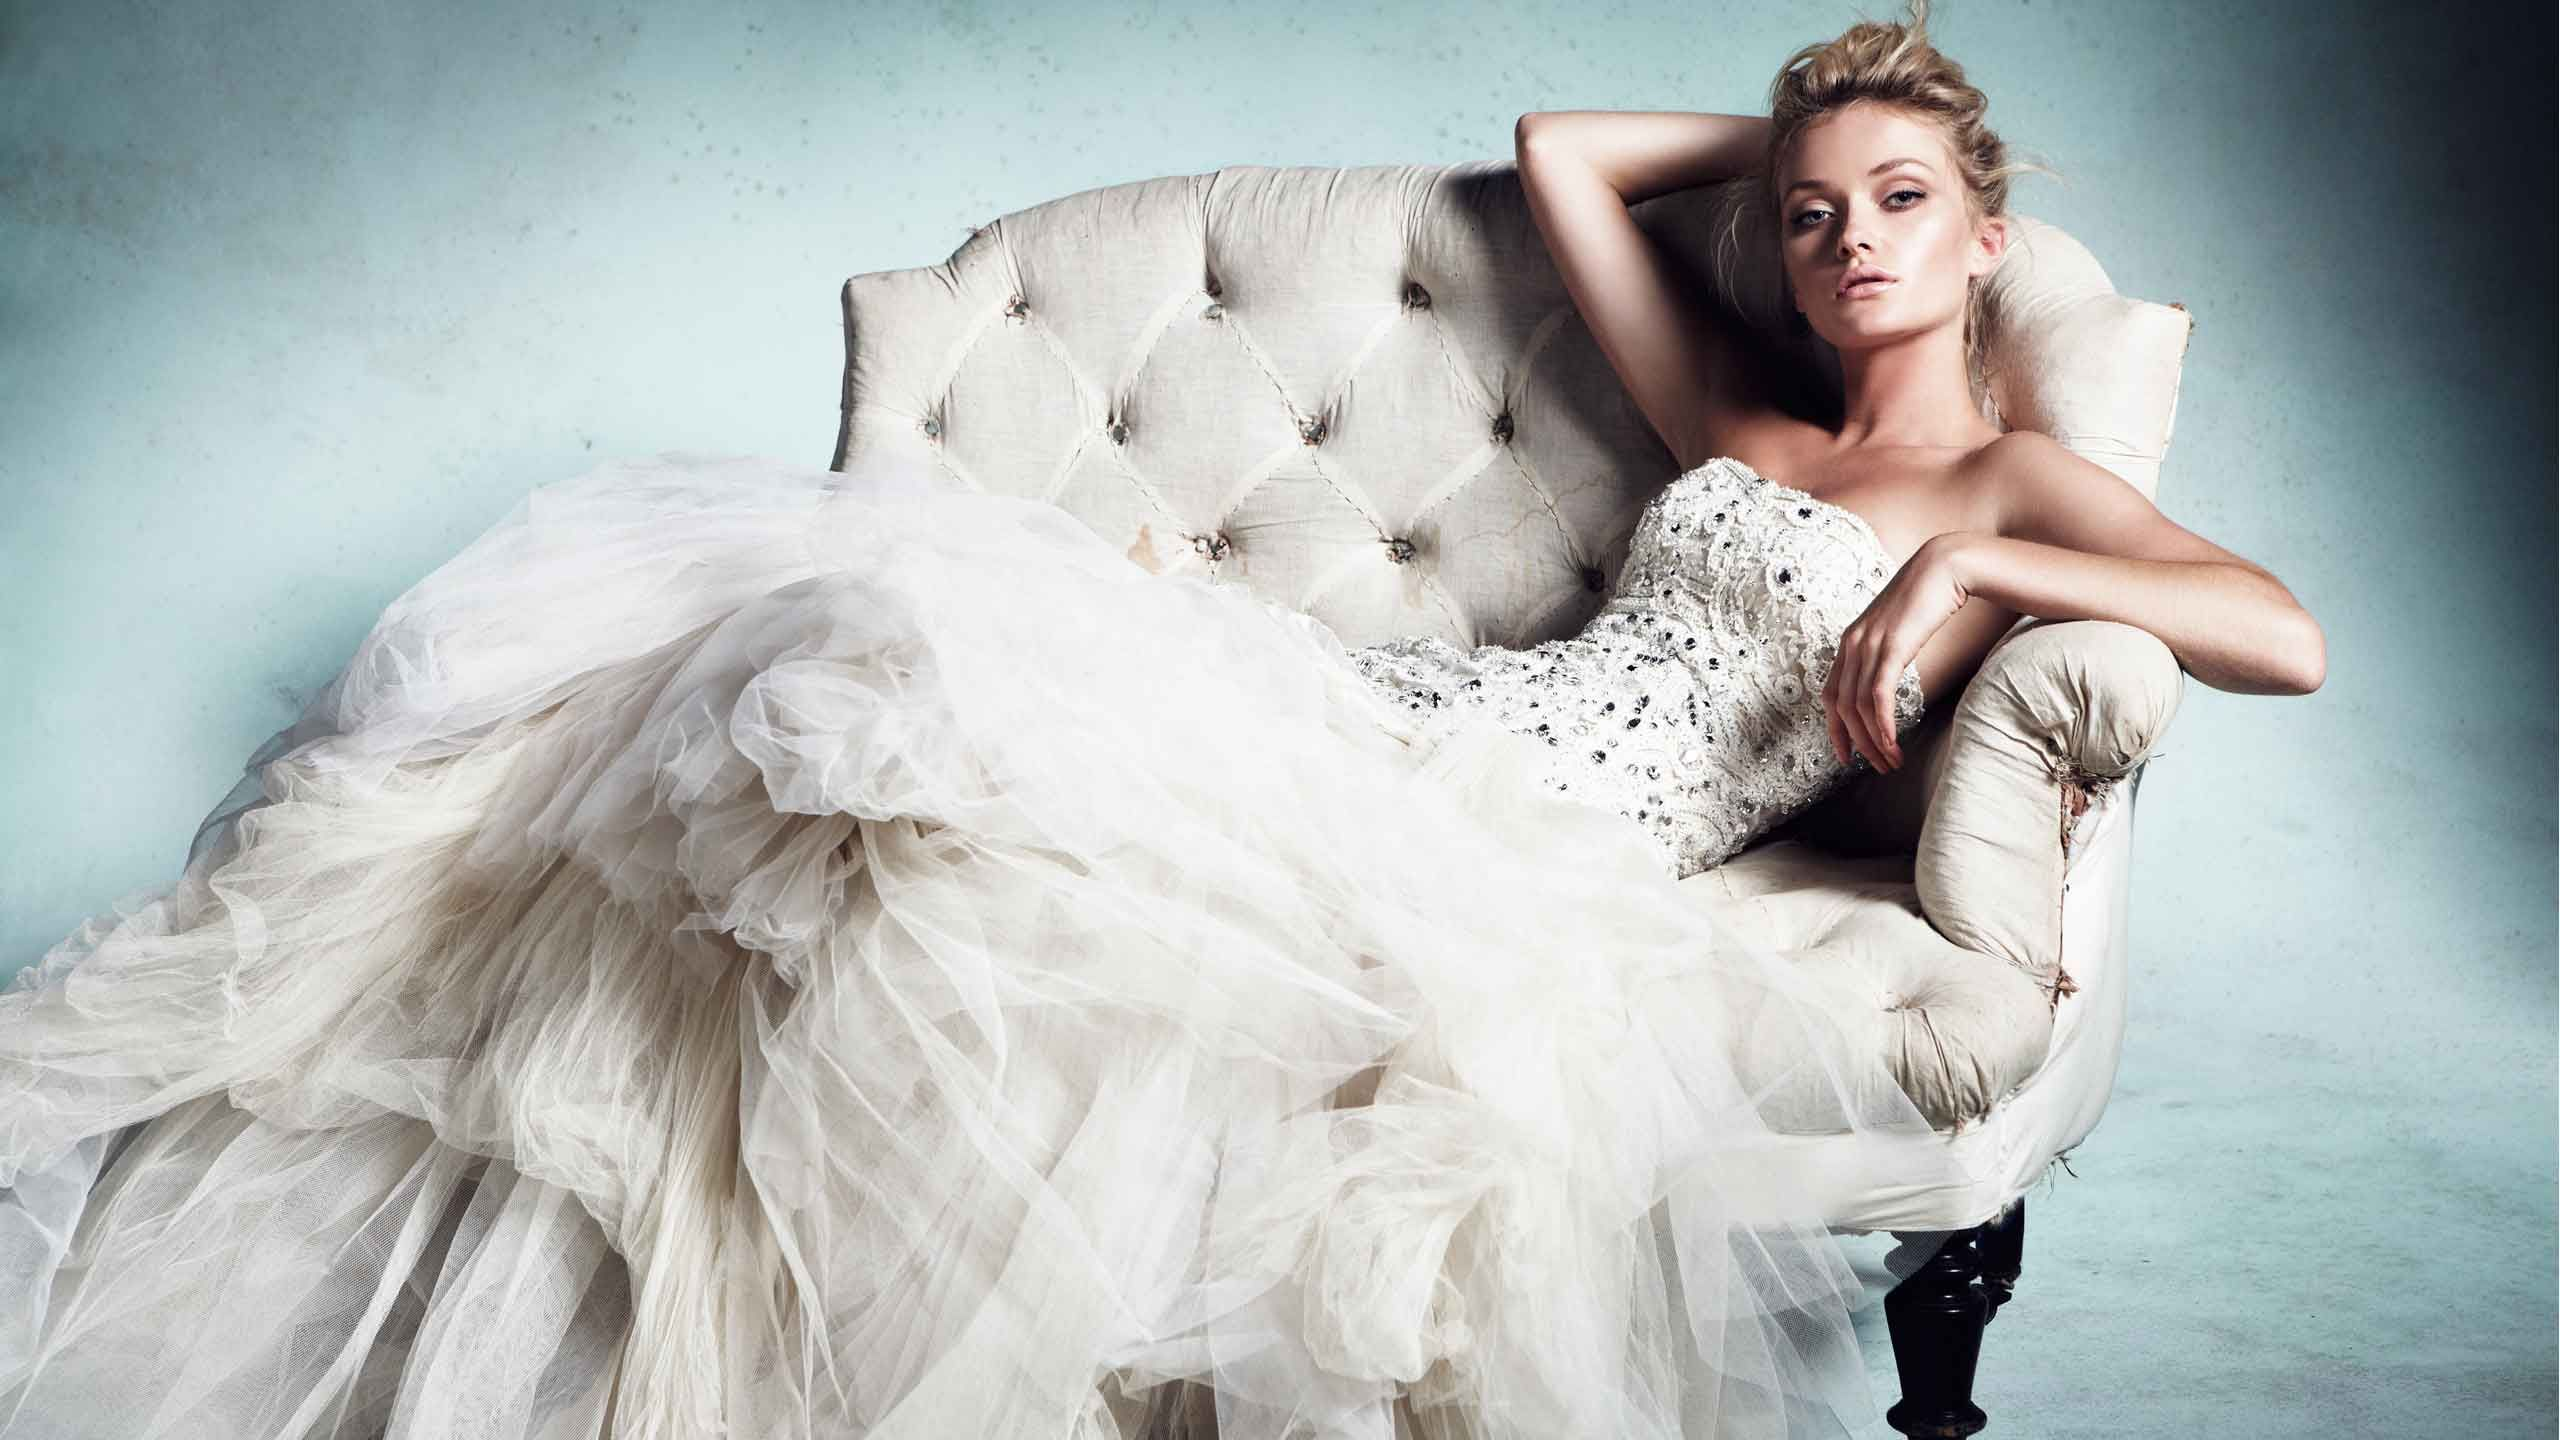 Wedding Dress Concept Photo Avant Garde Fashion Photography ... | A ...